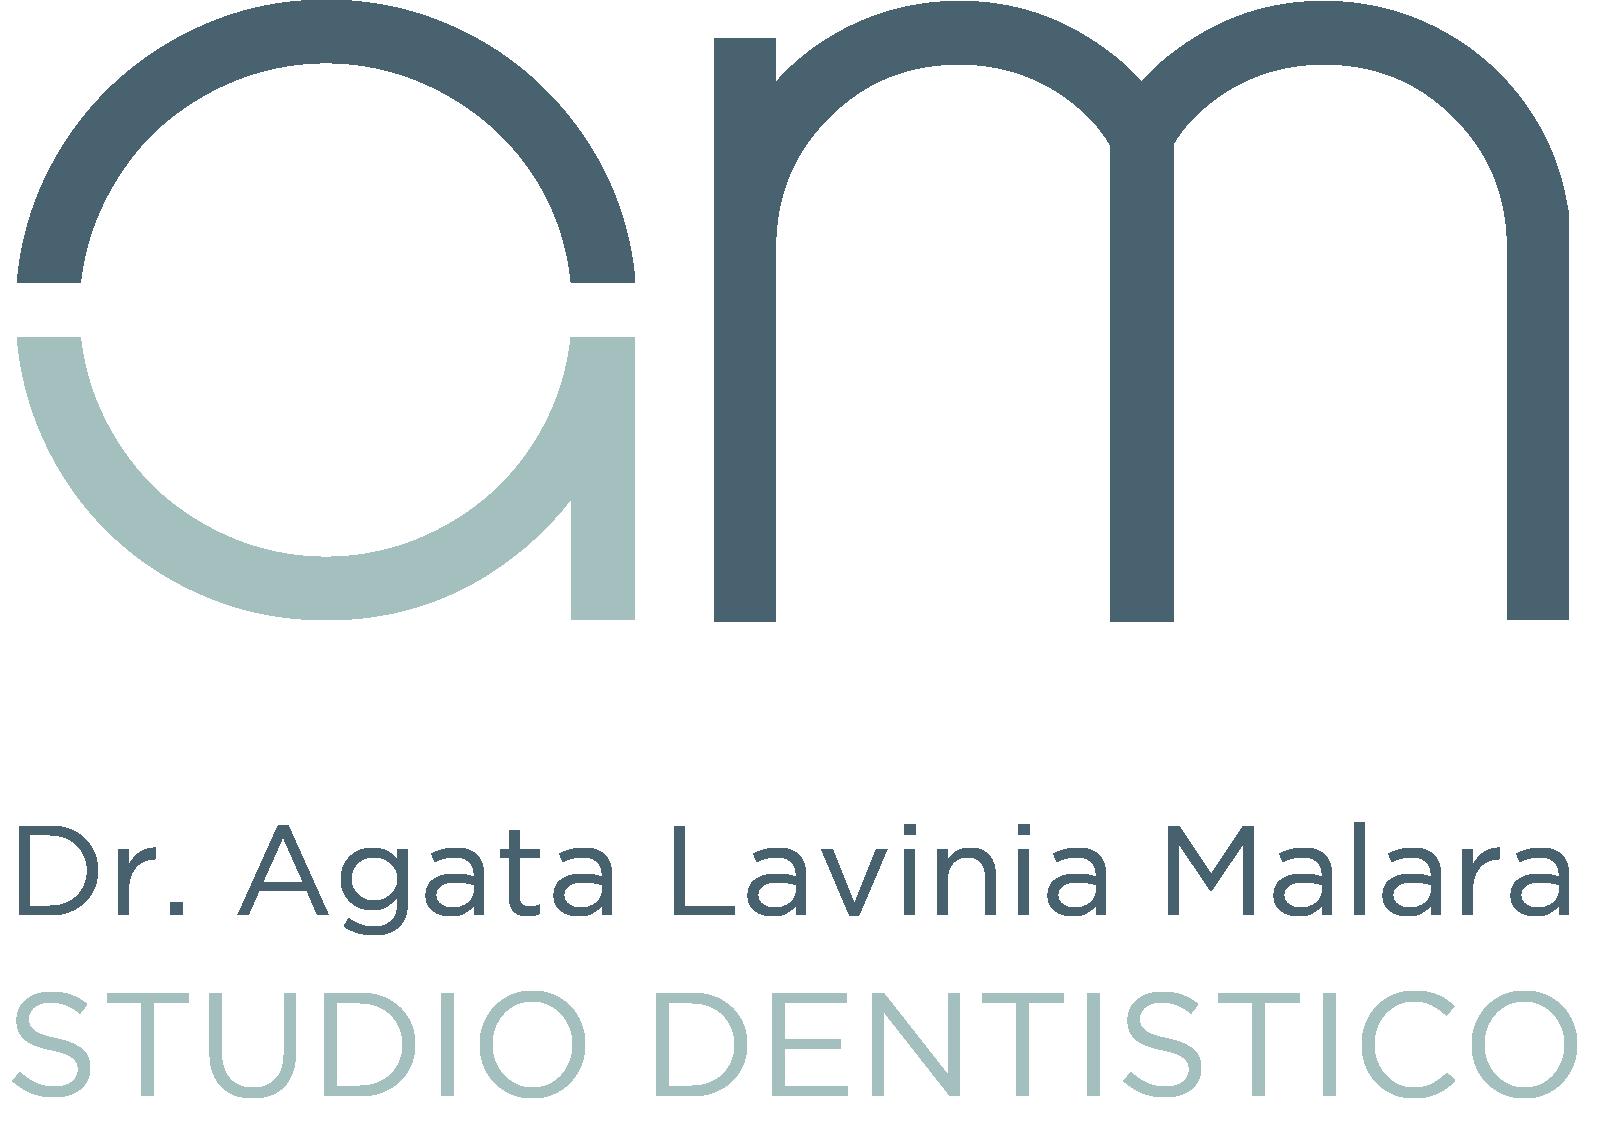 Studio Dentistico Malara